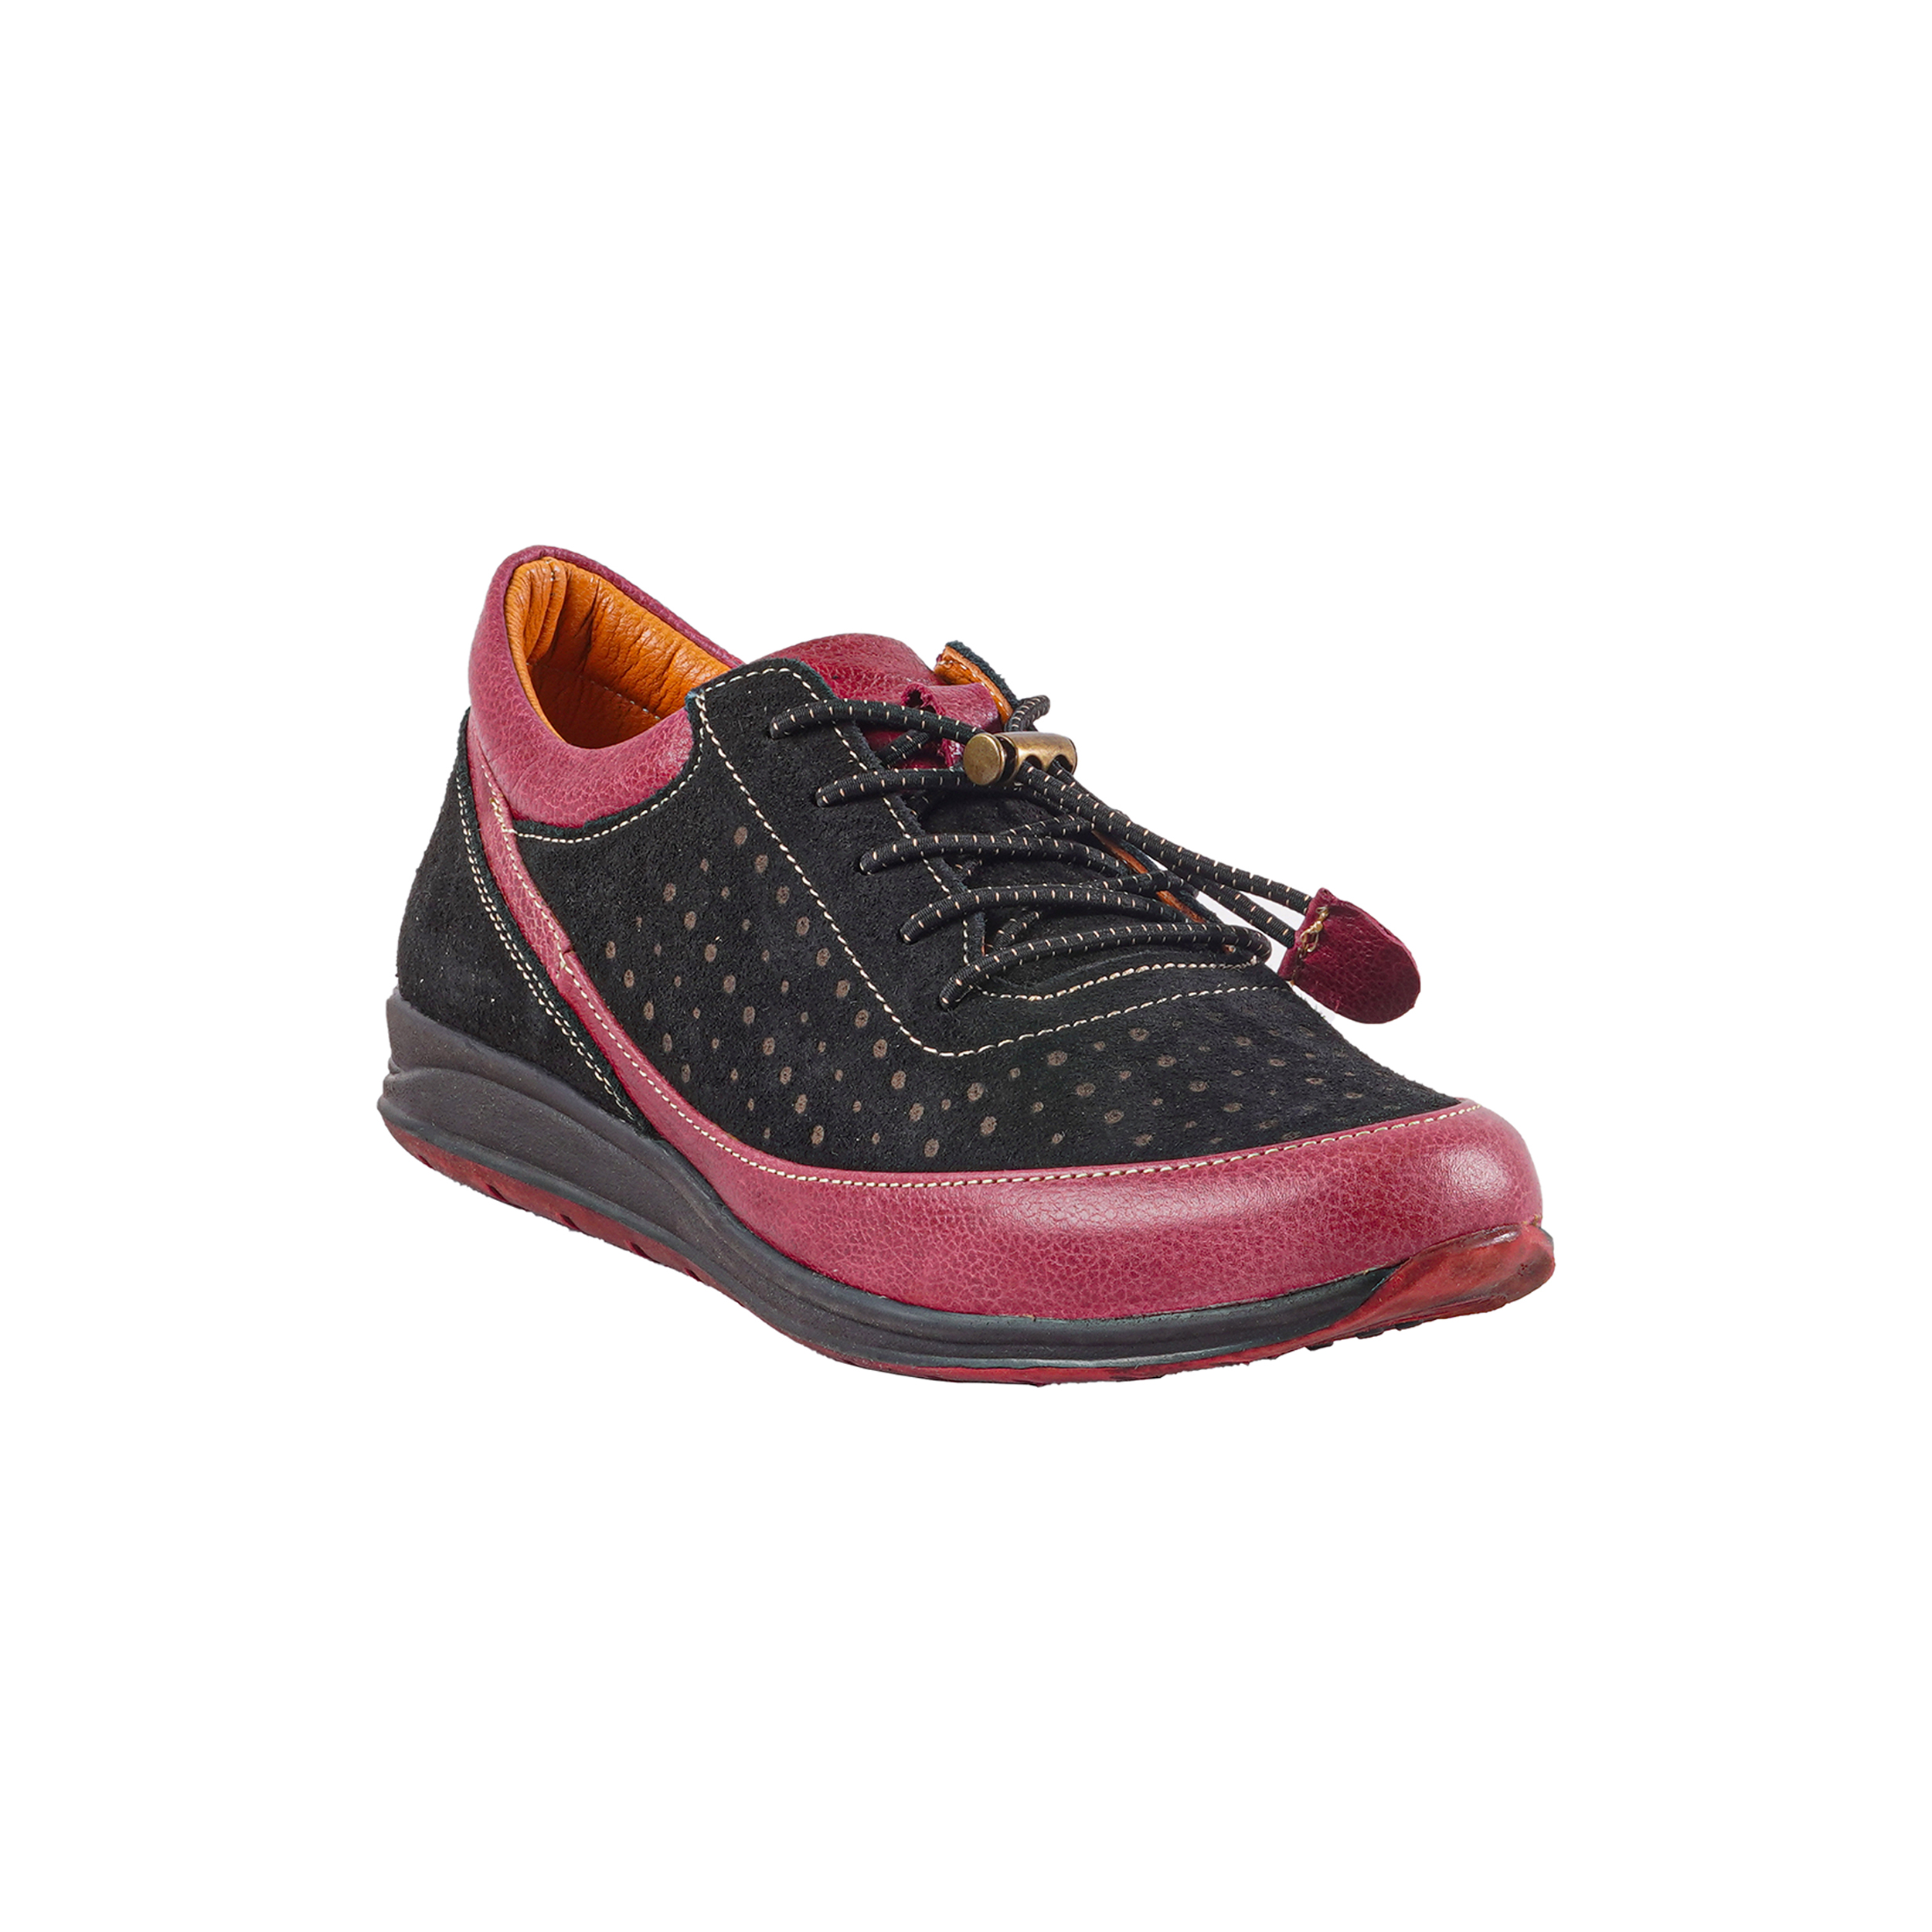 کفش روزمره زنانه صاد کد PP0706